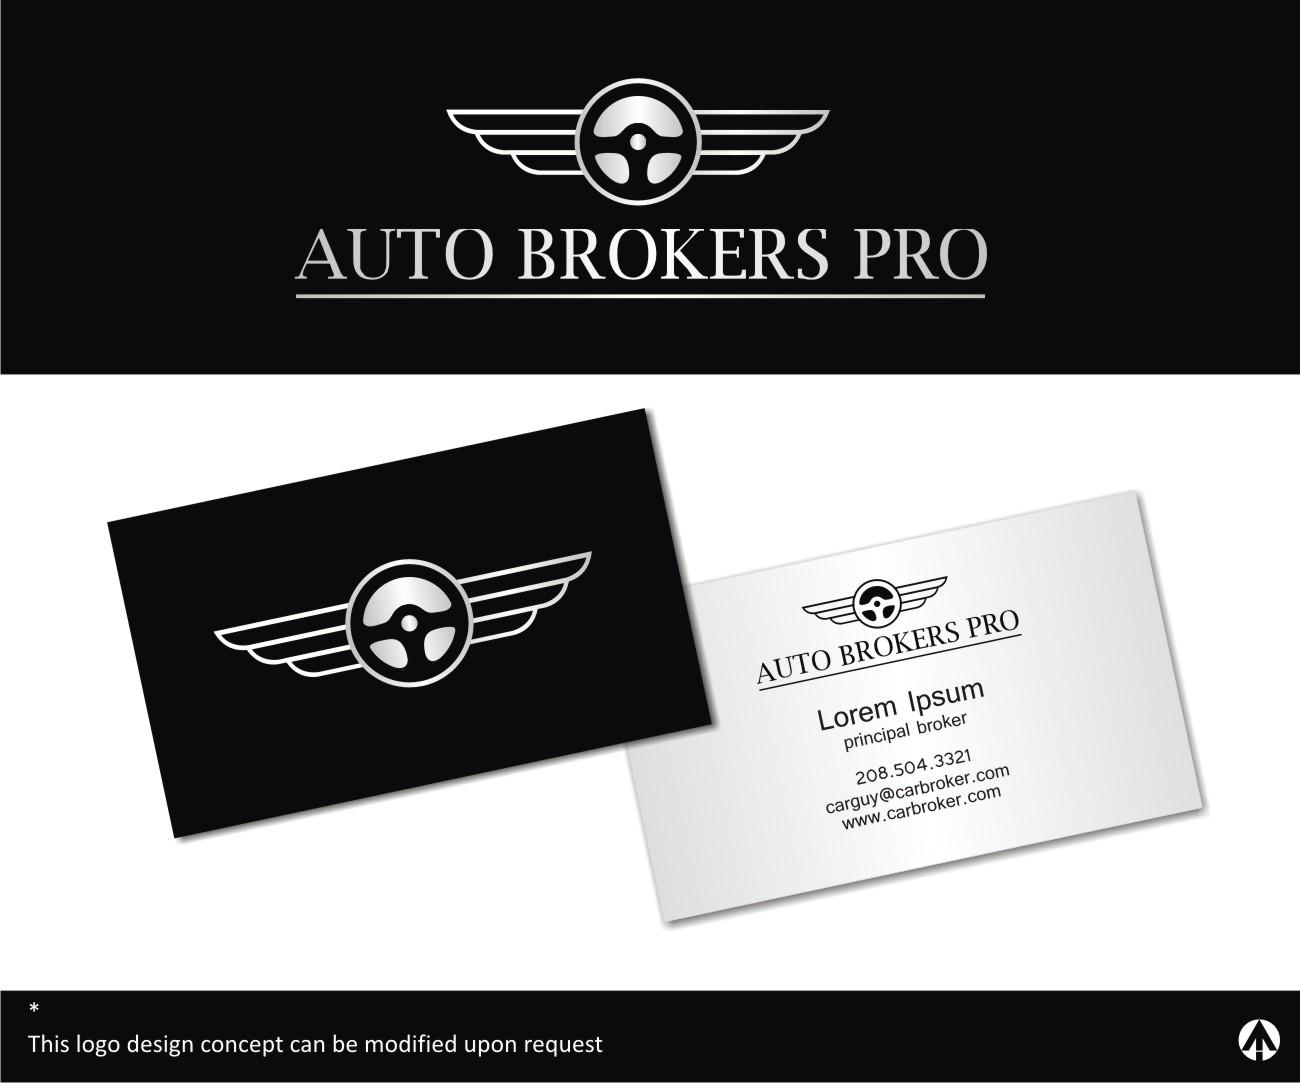 Upmarket, Elegant, Automotive Logo Design for Auto Brokers